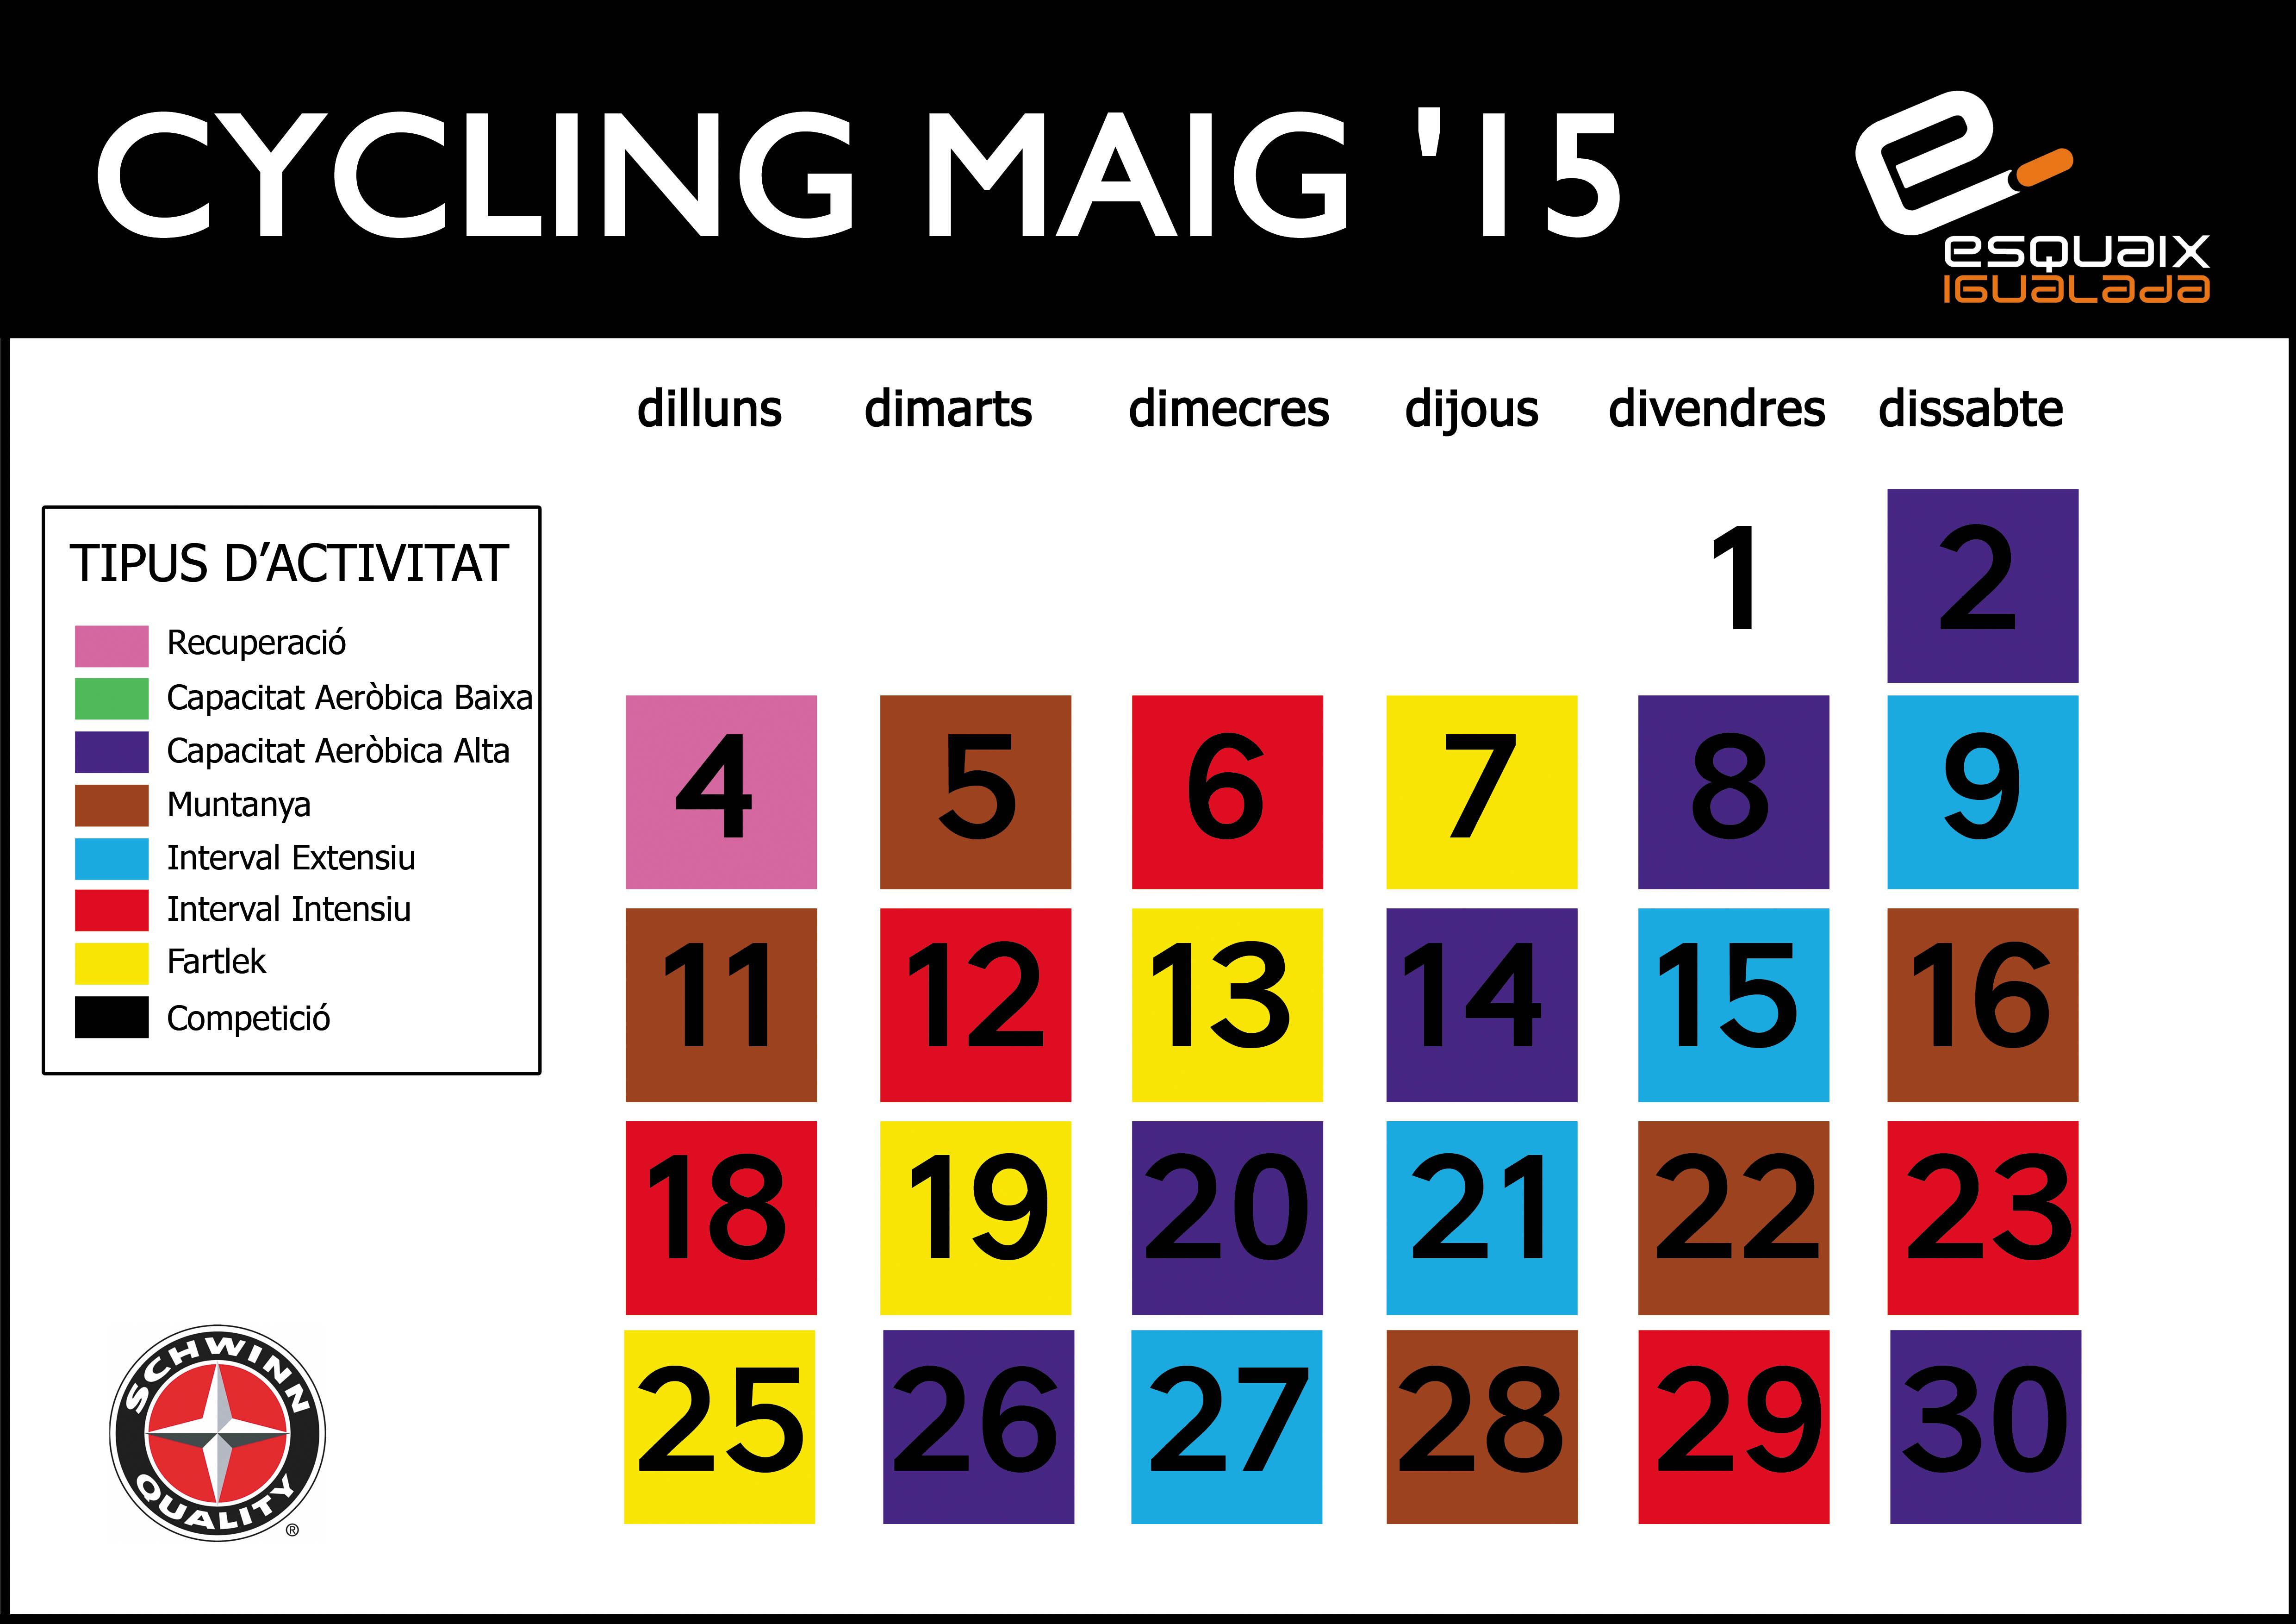 MAIG15_CYCLING_WEB.jpg